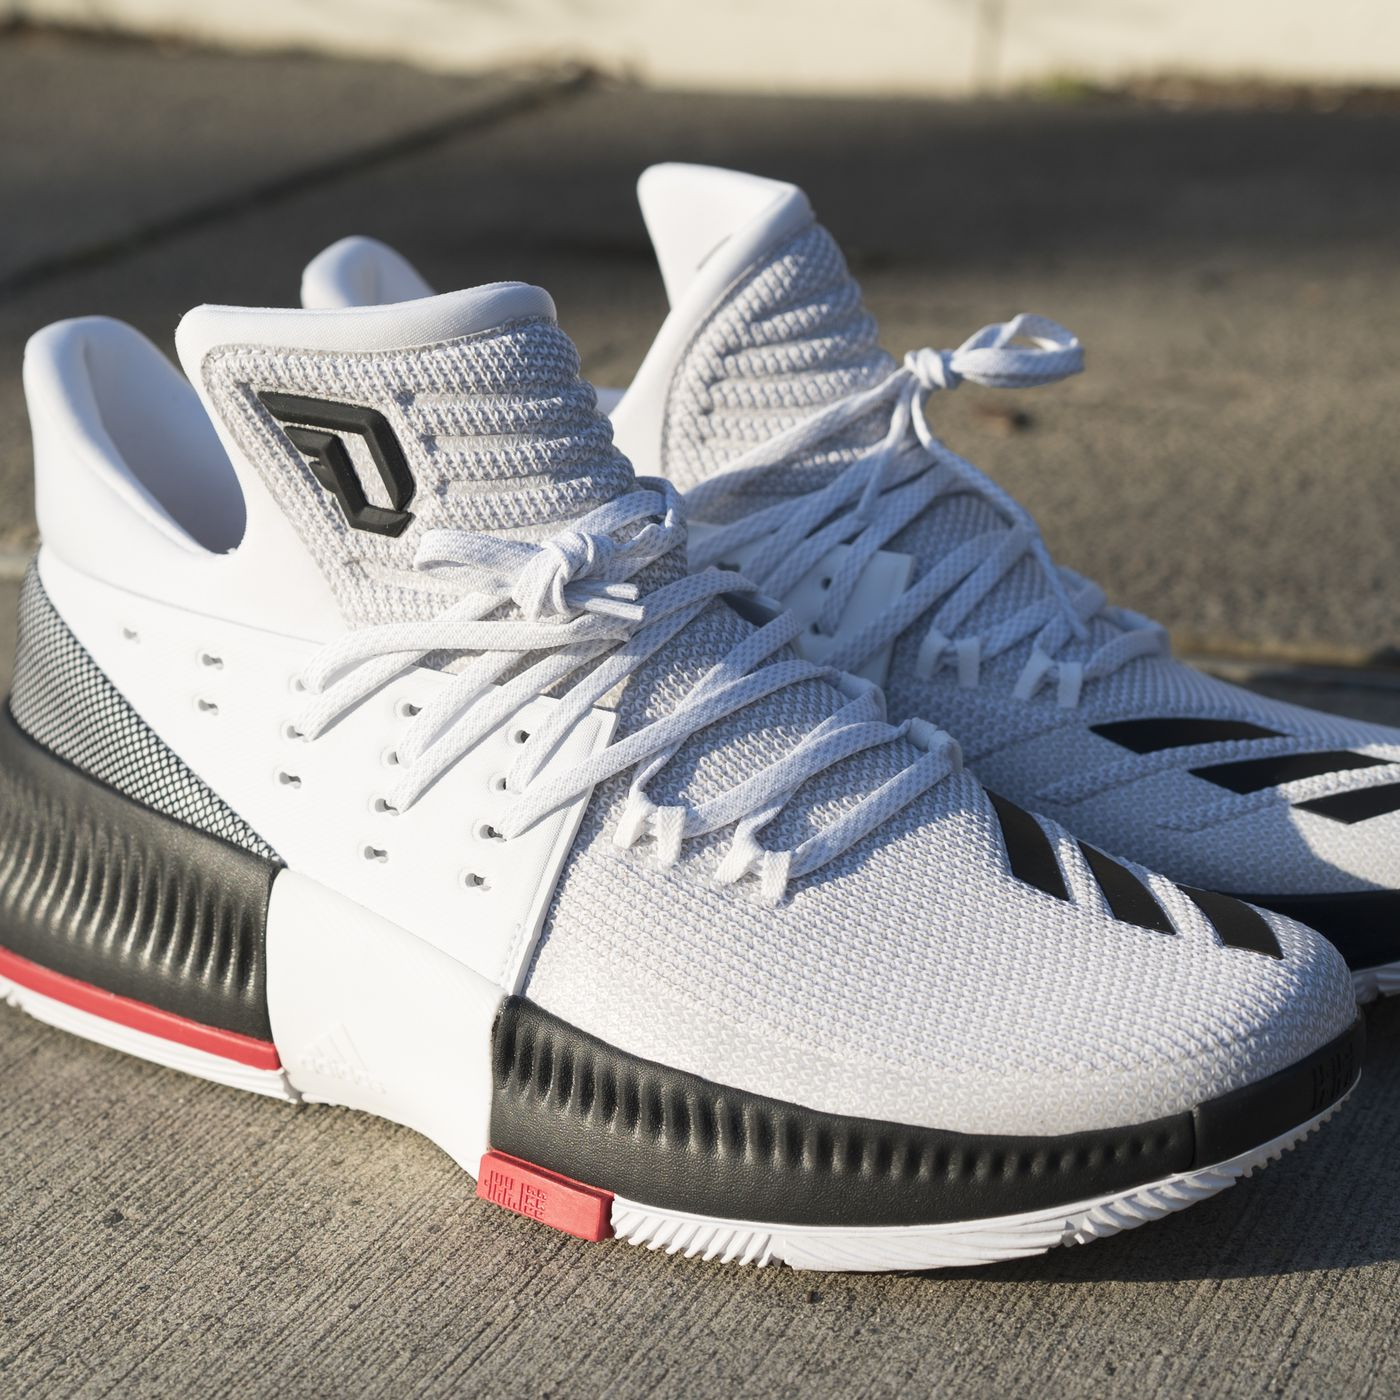 Review Adidas Damian Lillard Dame 3 Shoes Blazer S Edge